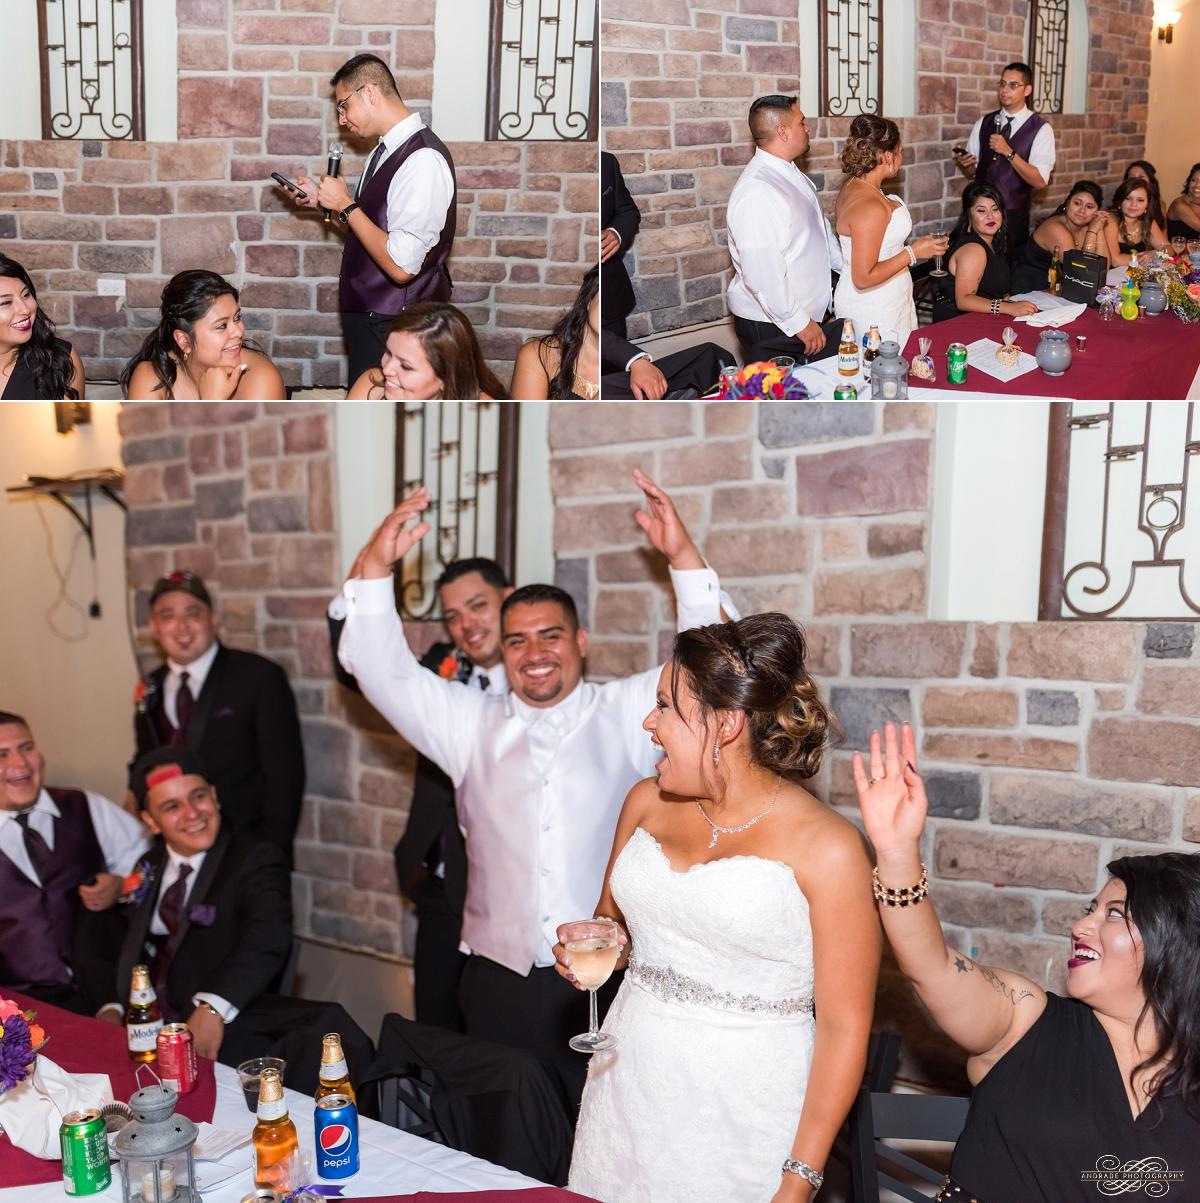 Janette + Louie Estebans Wedding Photography in Naperville - Naperville Wedding Photographer_0071.jpg